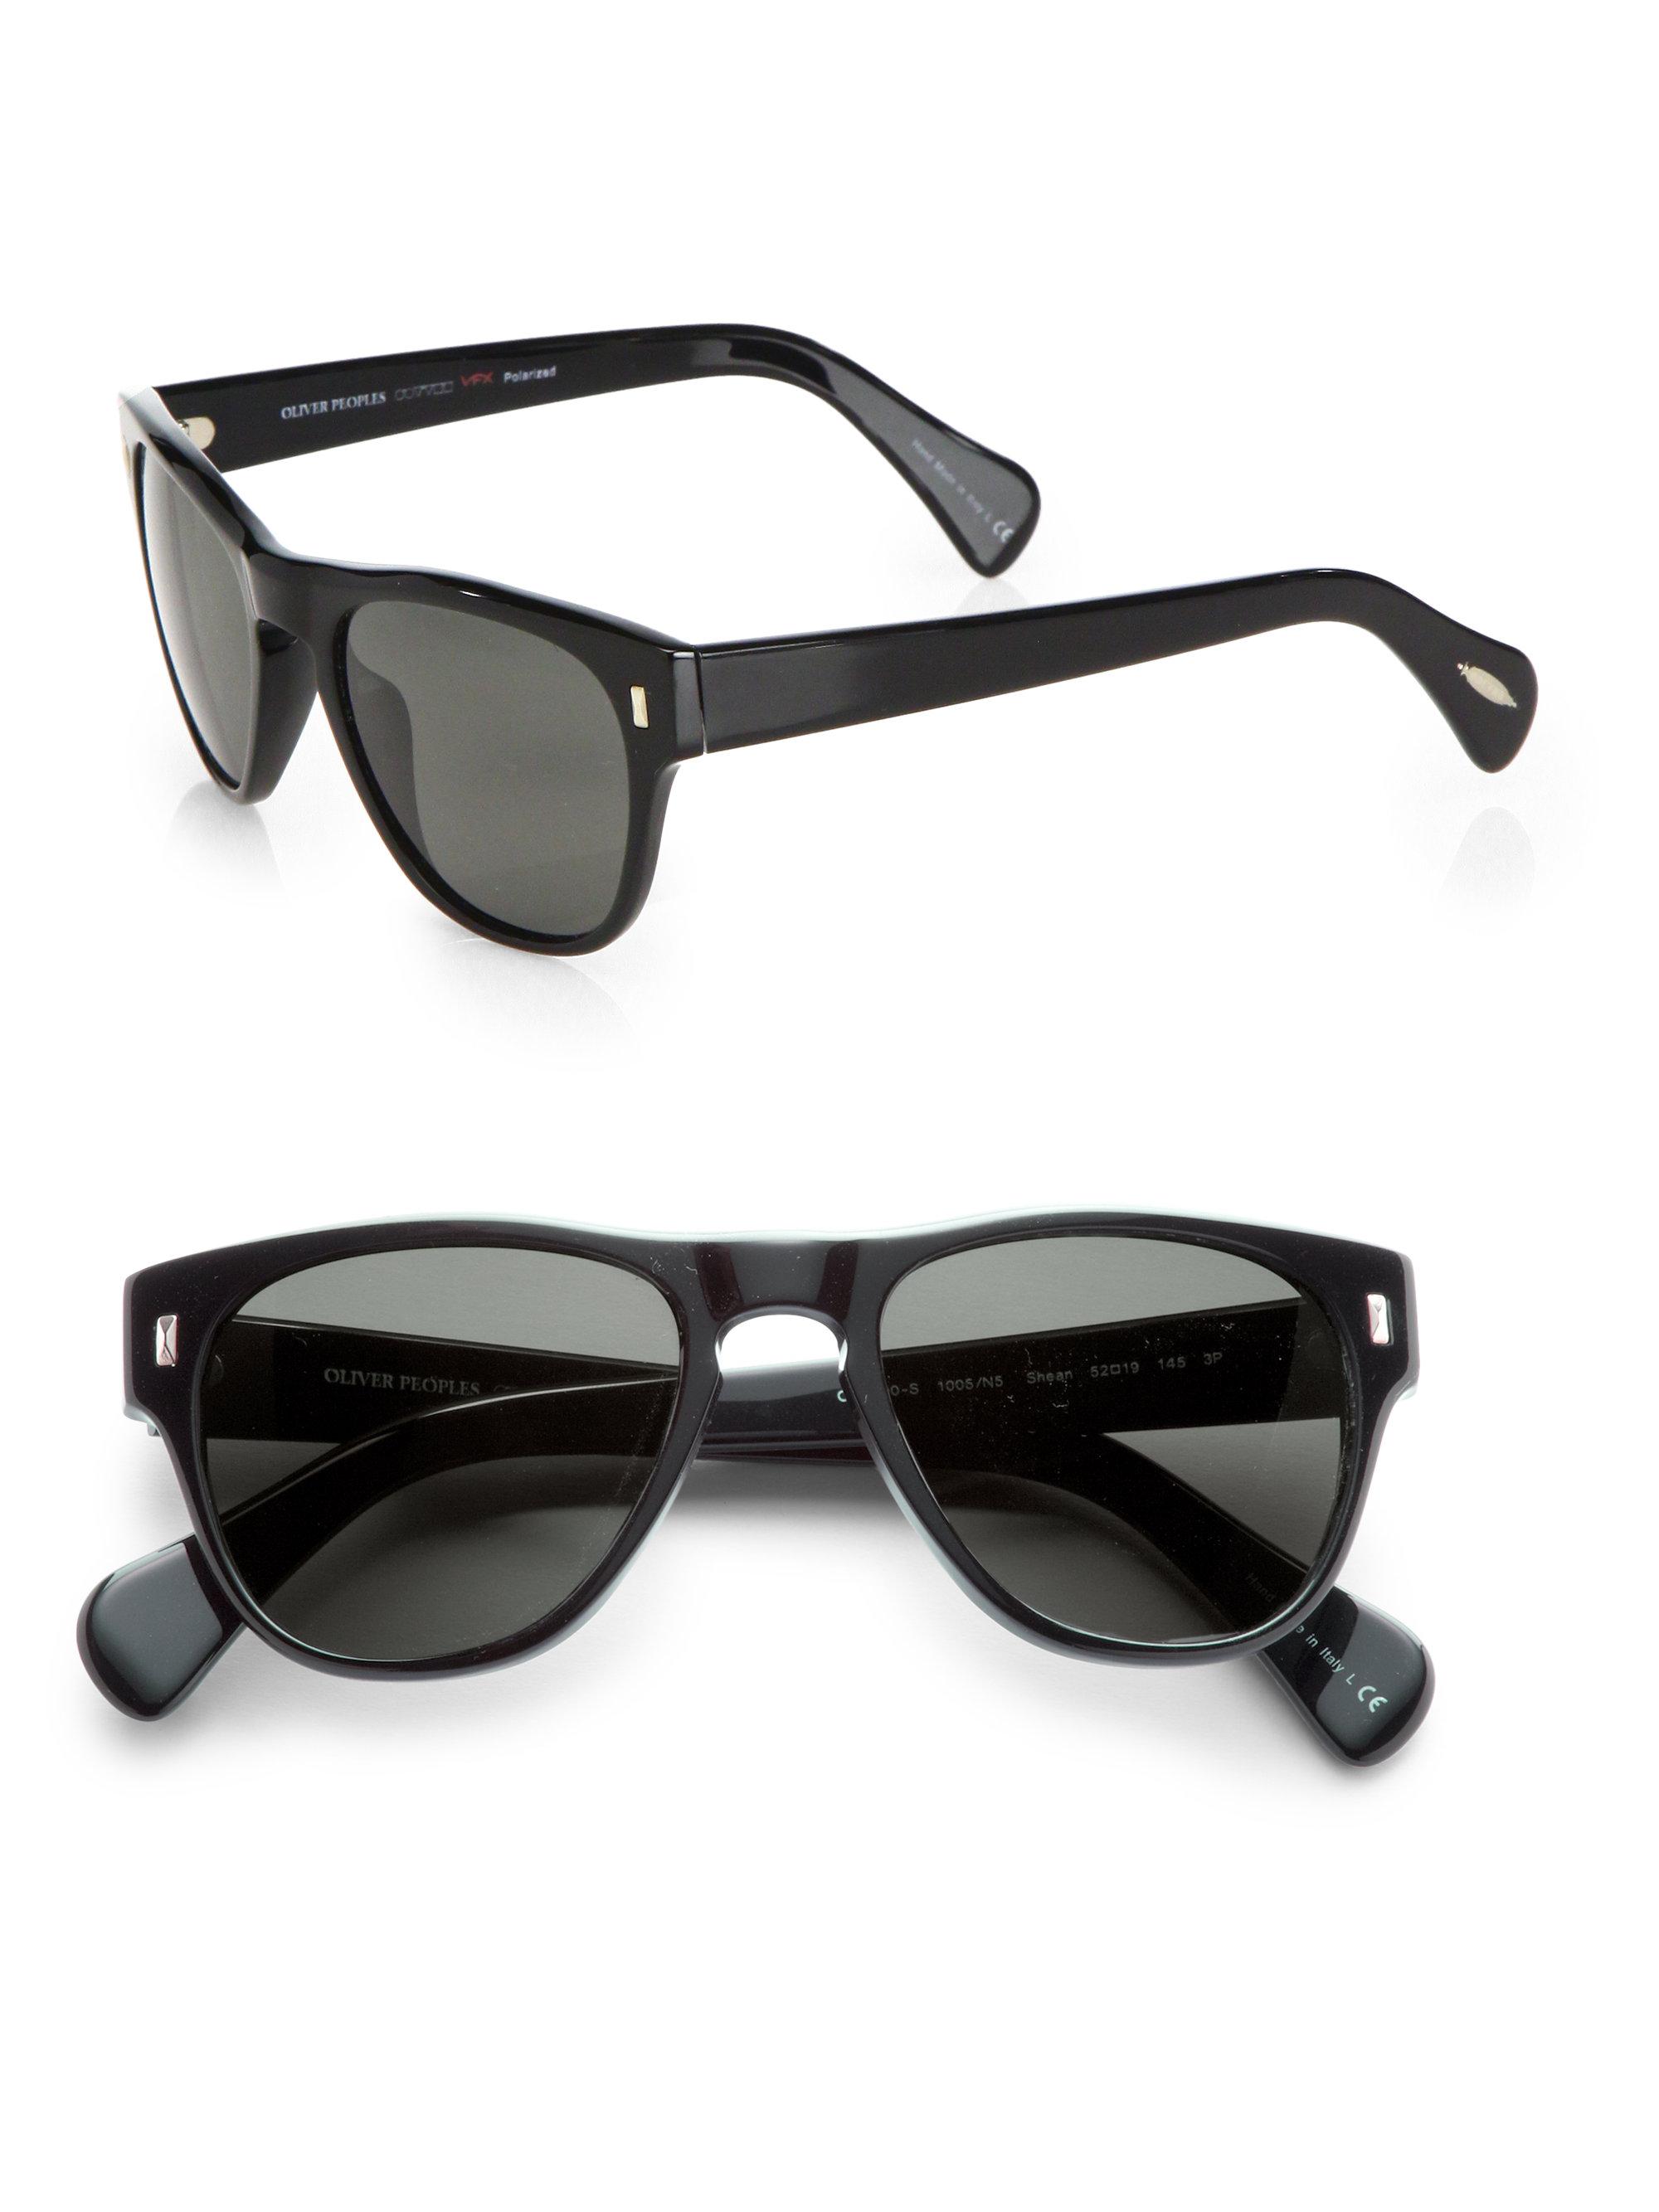 e8363b6490 Lyst - Oliver Peoples Shean Unisex Acetate Sunglasses in Black